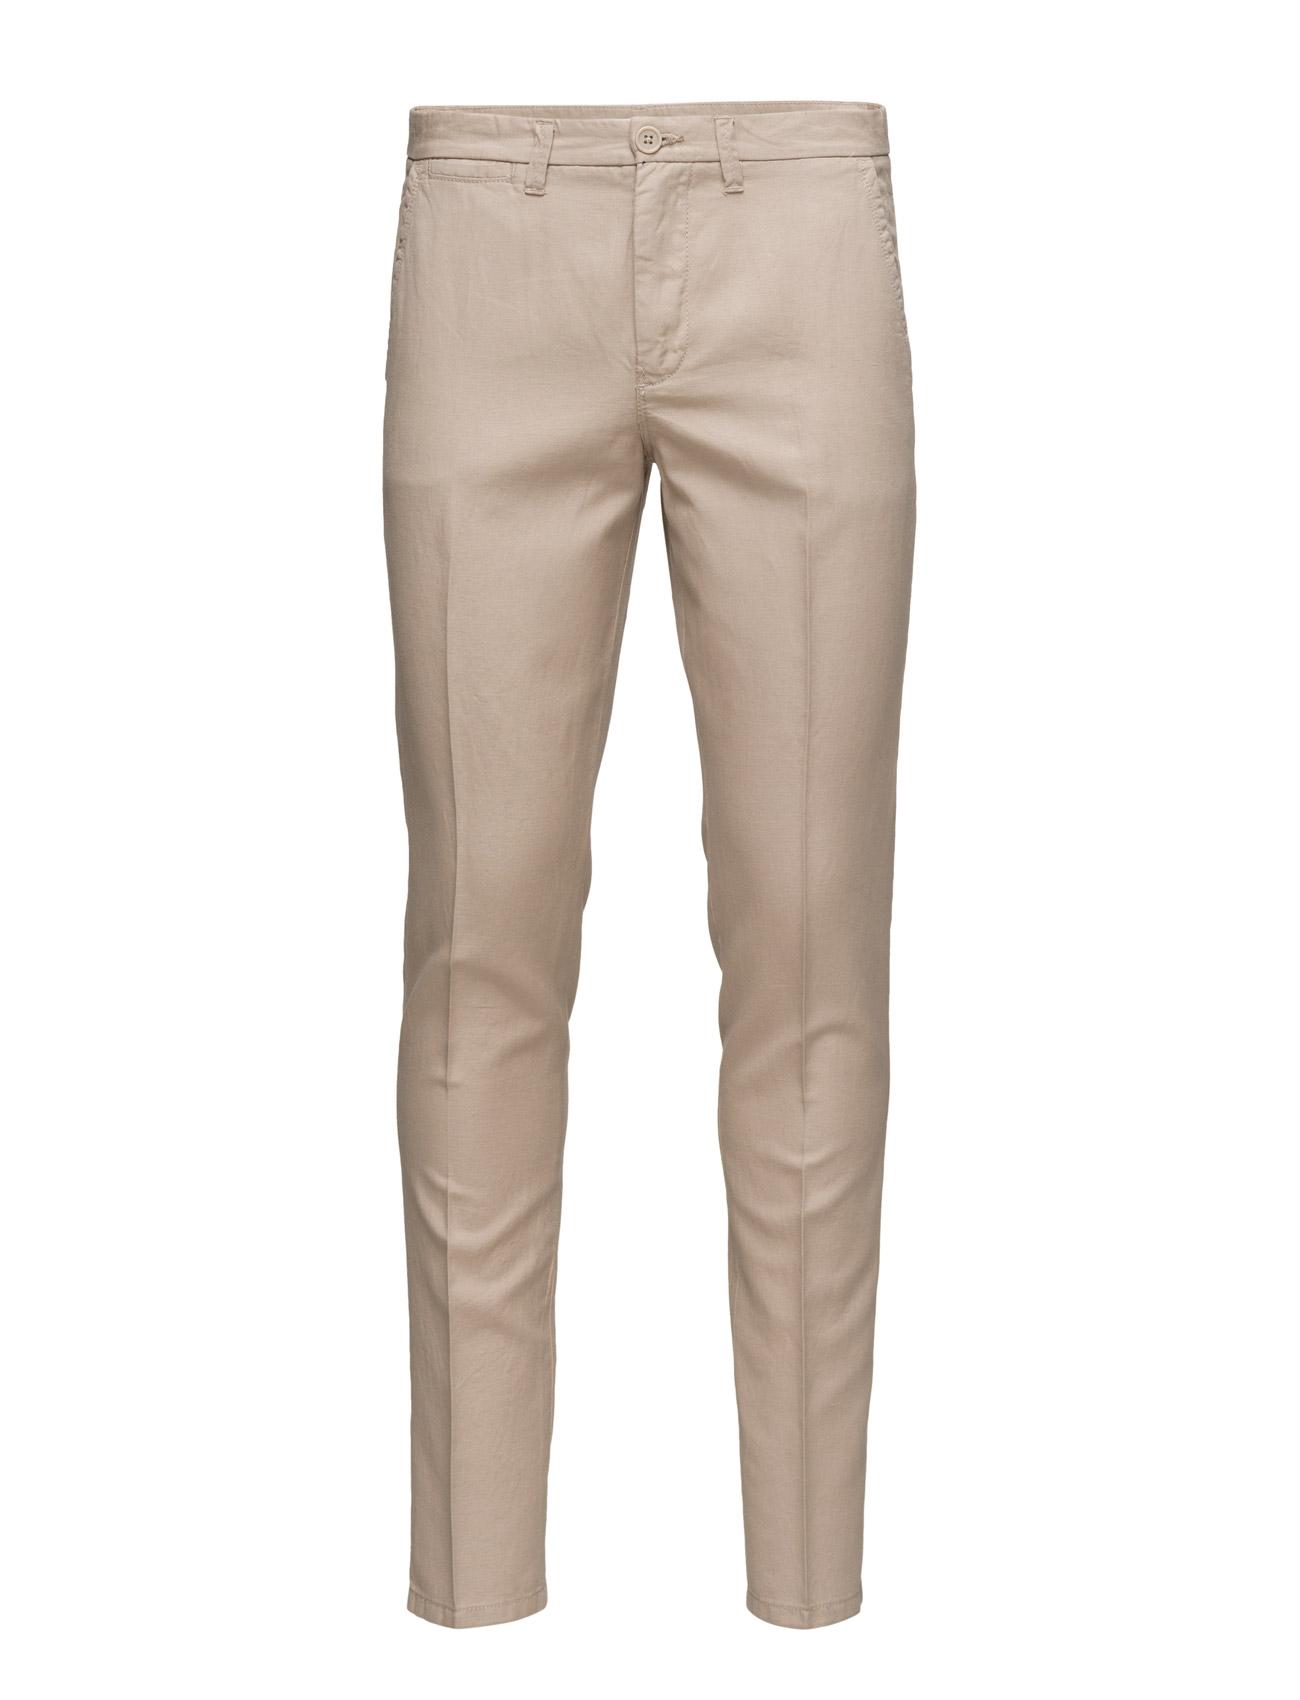 Trousers United Colors of Benetton Casual sko til Mænd i